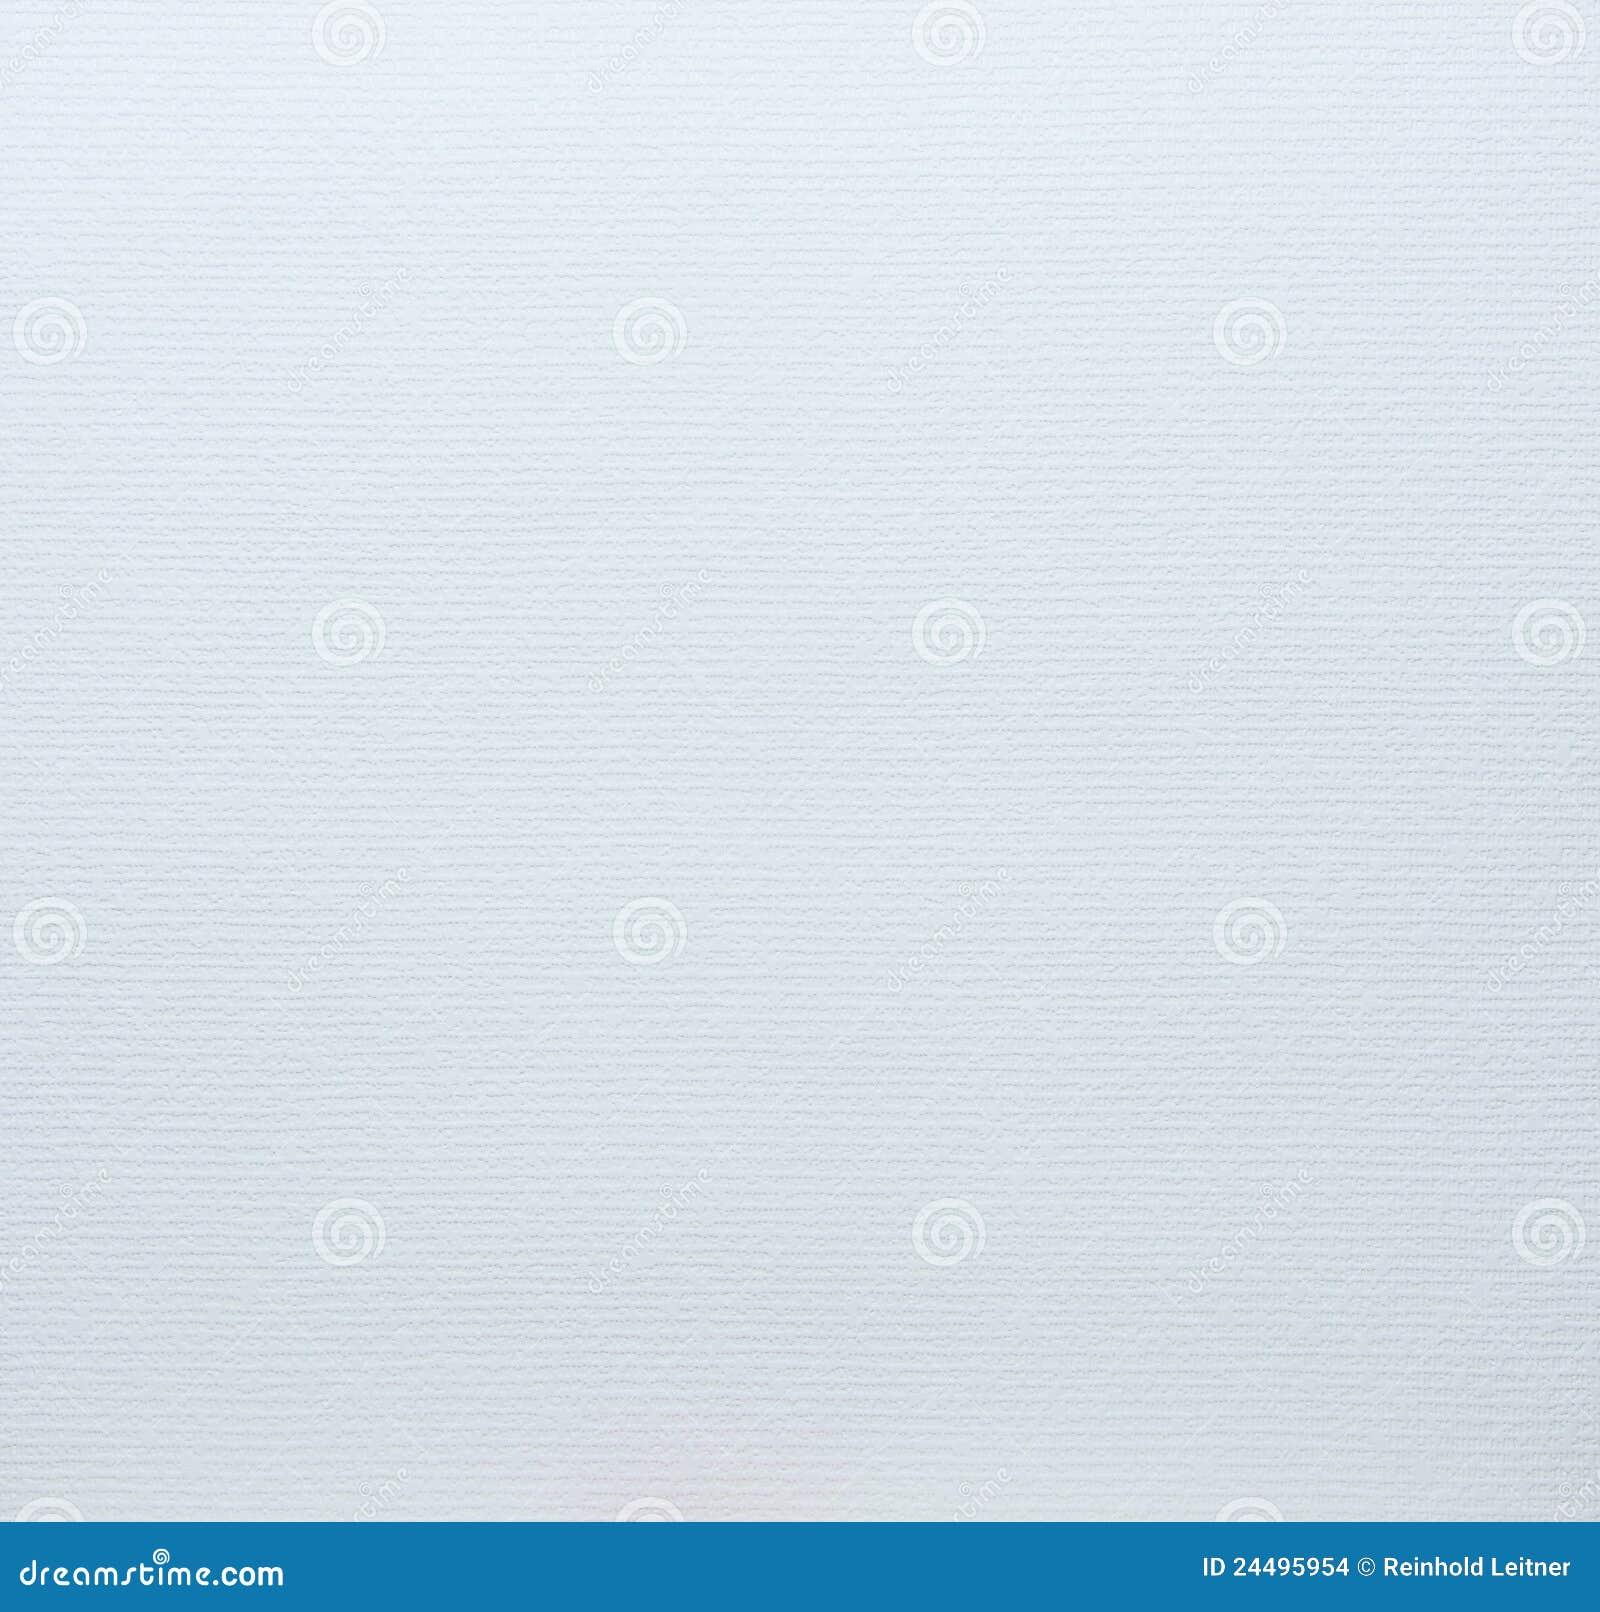 Carta da parati bianca immagini stock immagine 24495954 for Stock carta da parati